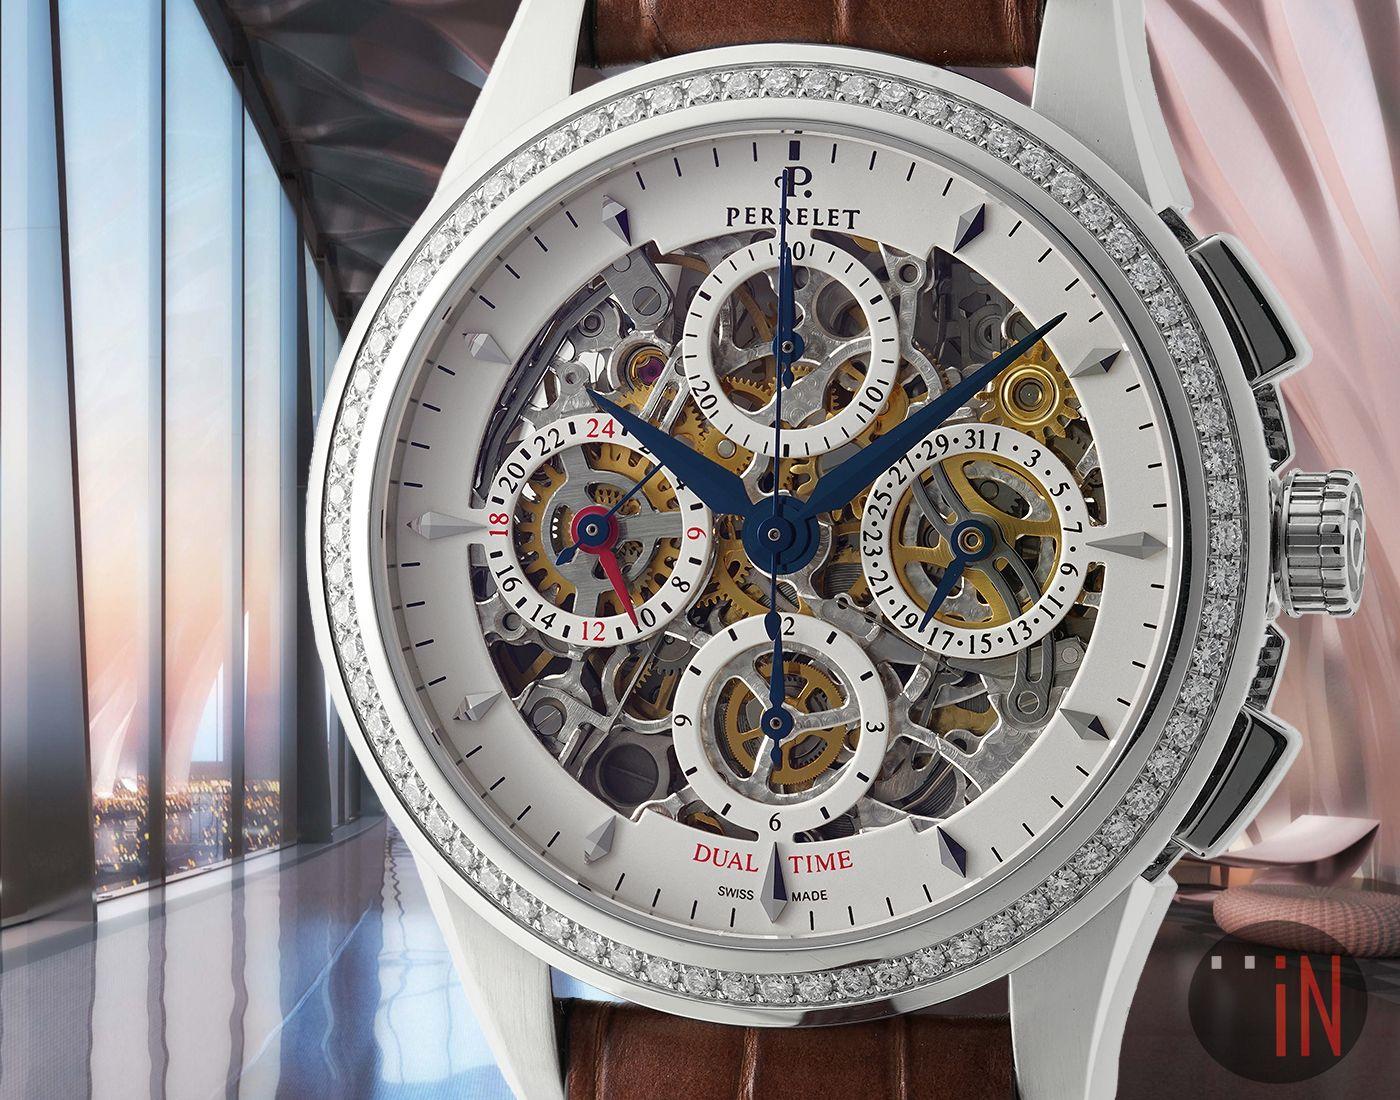 """A Clear View!"" #Perrelet 42mm Skeleton Dual Time Chrono Diamond Bezel Ref#: A1010/10  ($6,725.00 USD) http://www.elementintime.com/Perrelet-Skeleton-Dual-Time-Chronograph-A101010-7038"